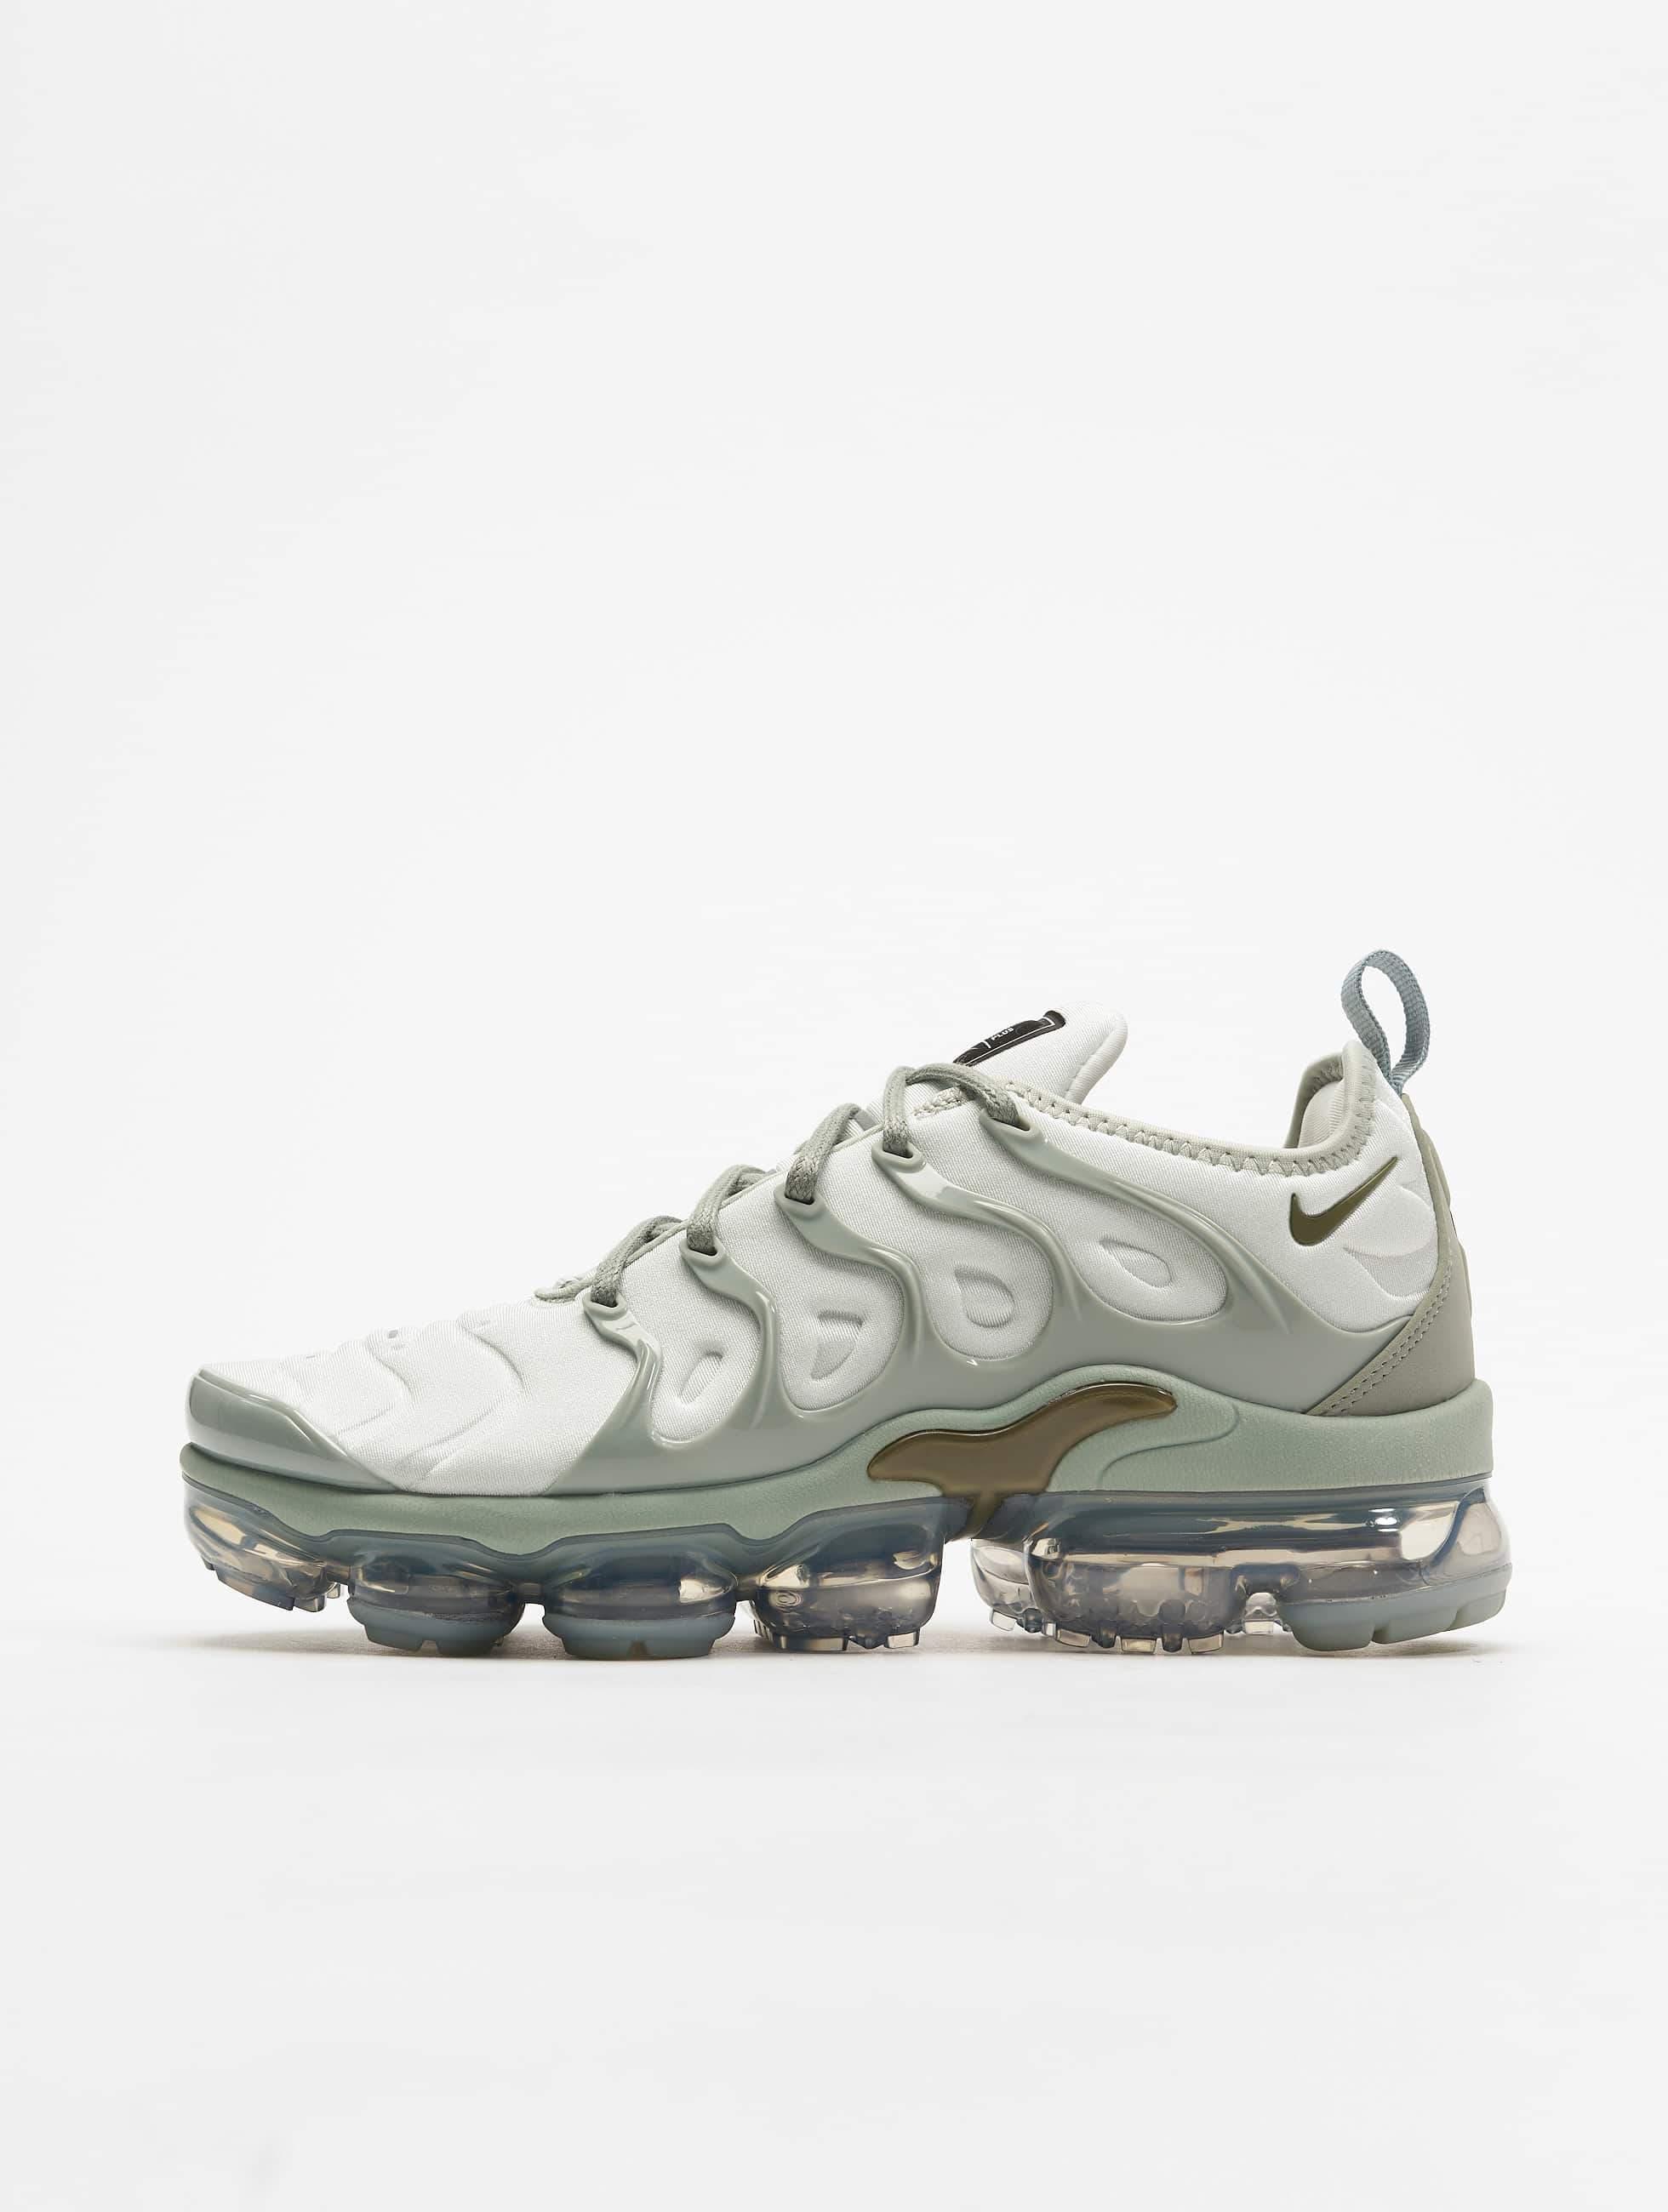 Nike Air Vapormax Plus Sneakers Light SilvernMedium OliveMica Green